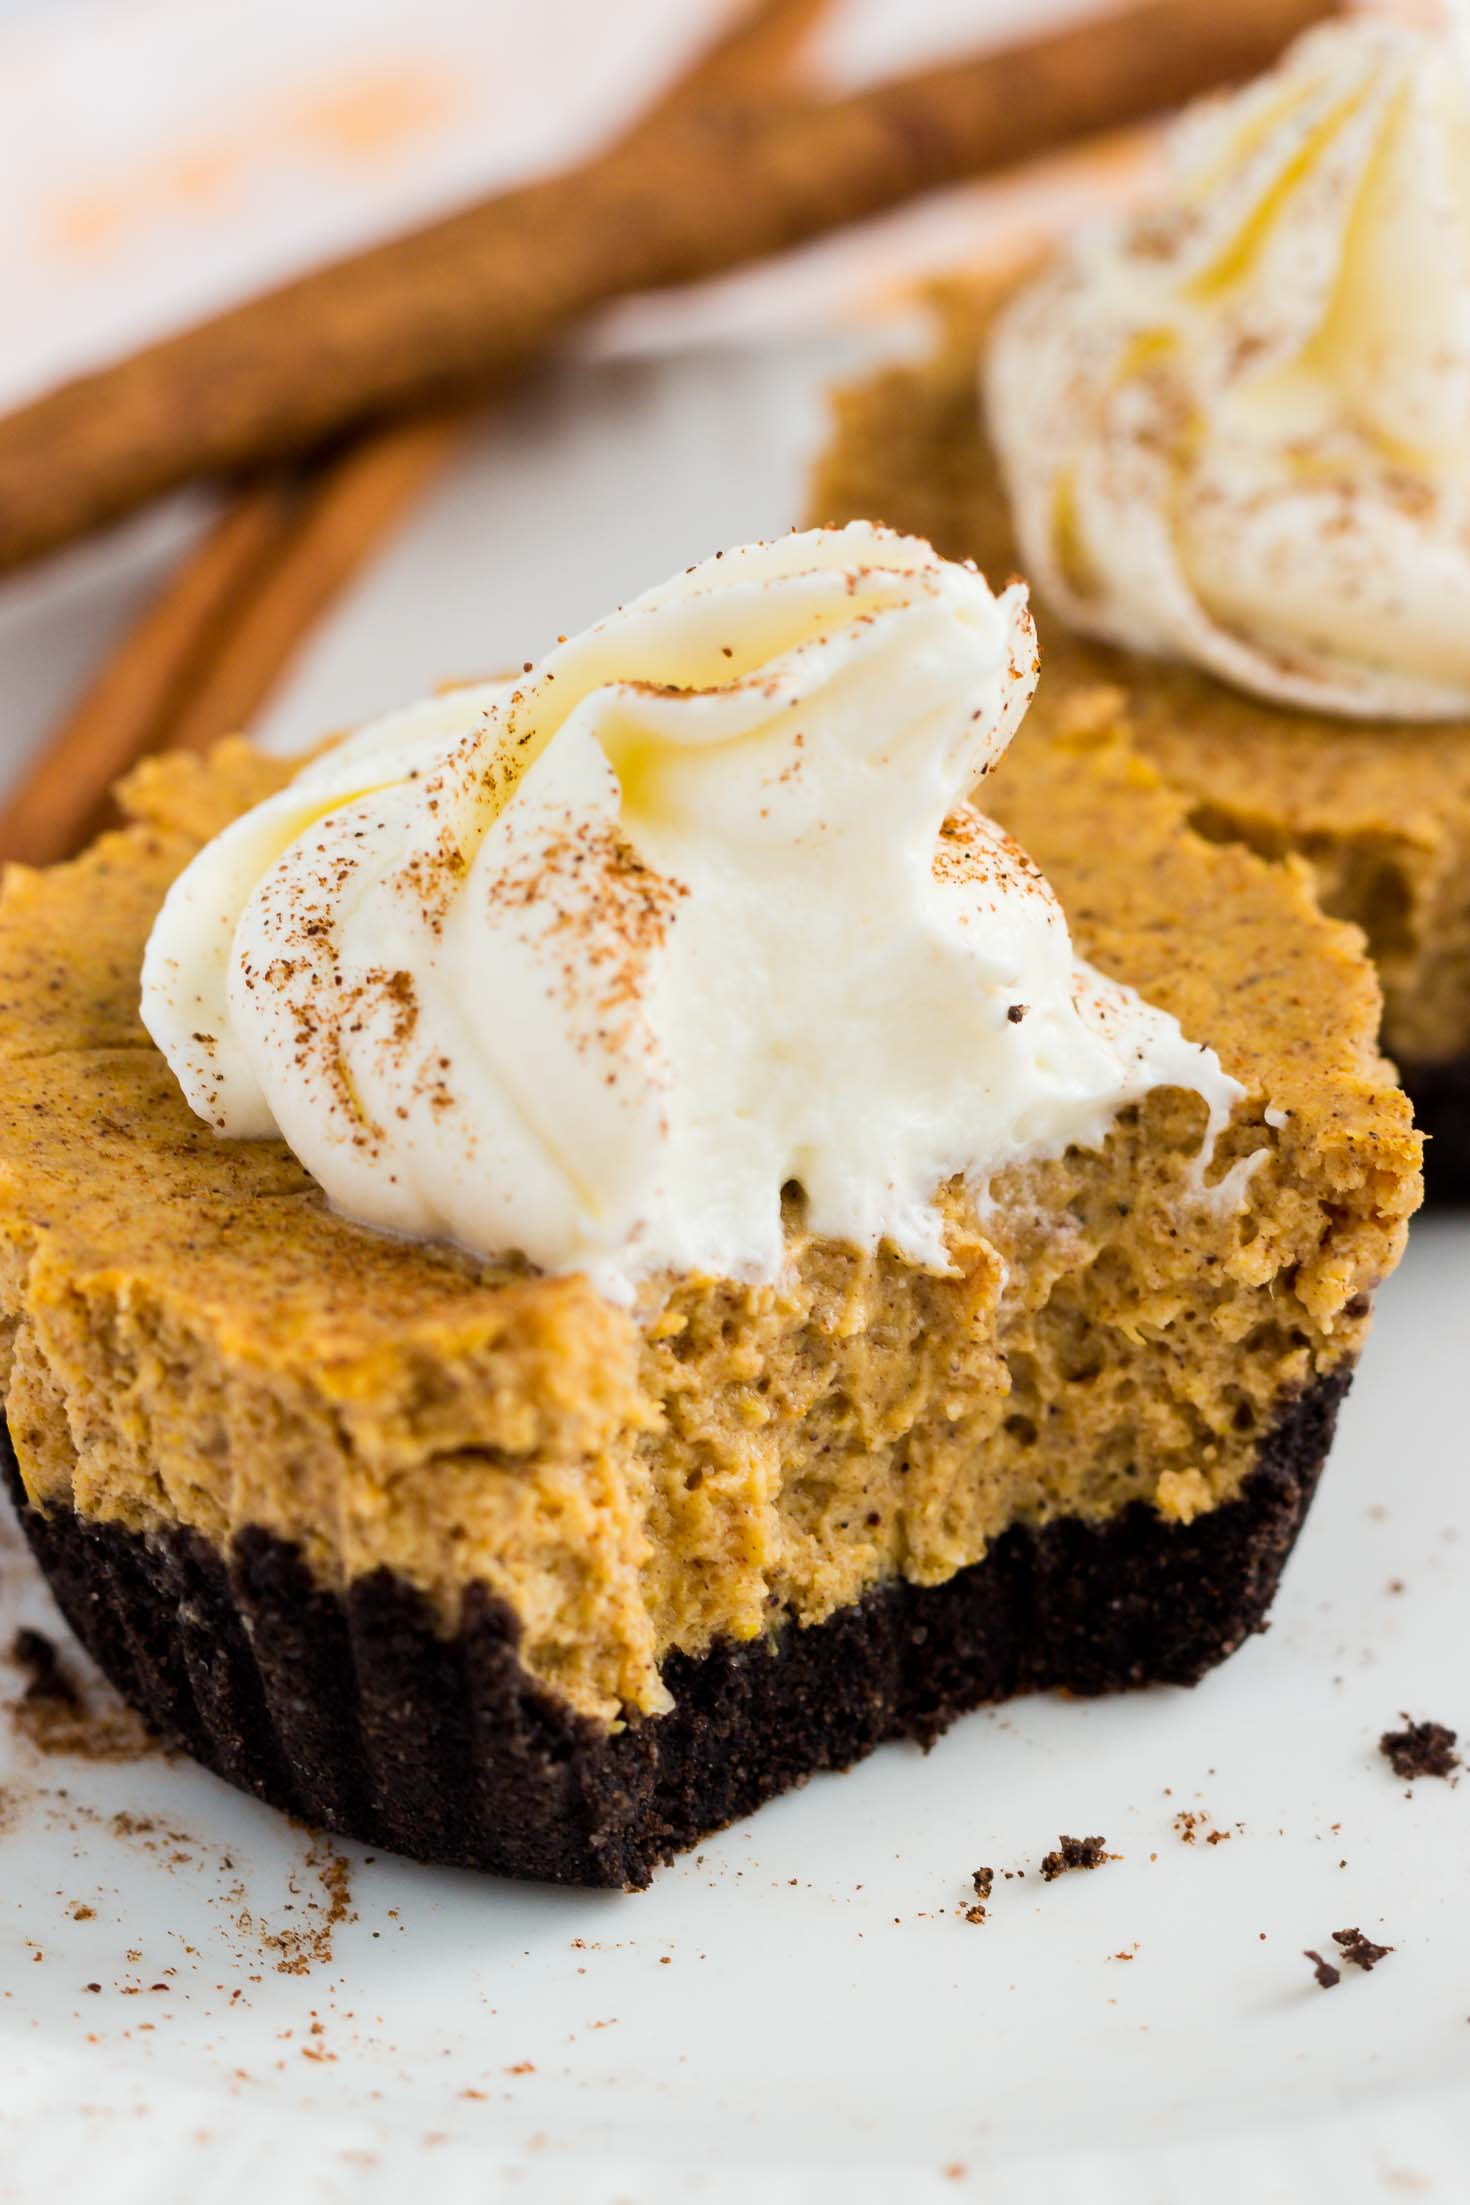 Chocolate-Bottom Pumpkin Mini Cheesecakes-closeup sideview showing inside texture